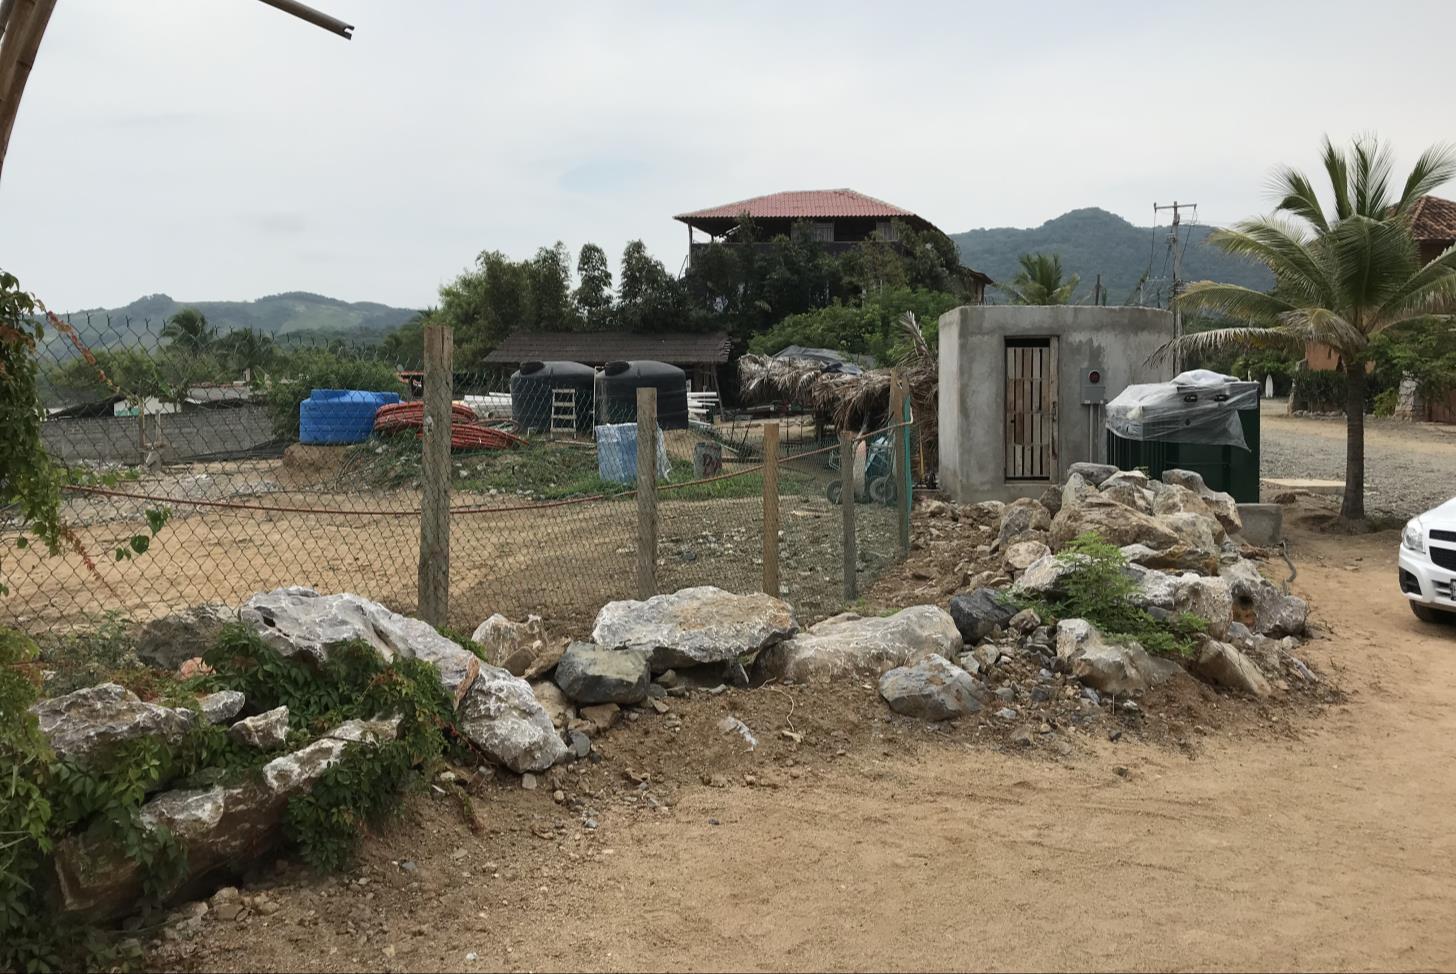 REPORTE-FOTOGRAFICO-PUNTA-MAJAHUA-18-DE-AGOSTO-DEL-2018-052.jpg